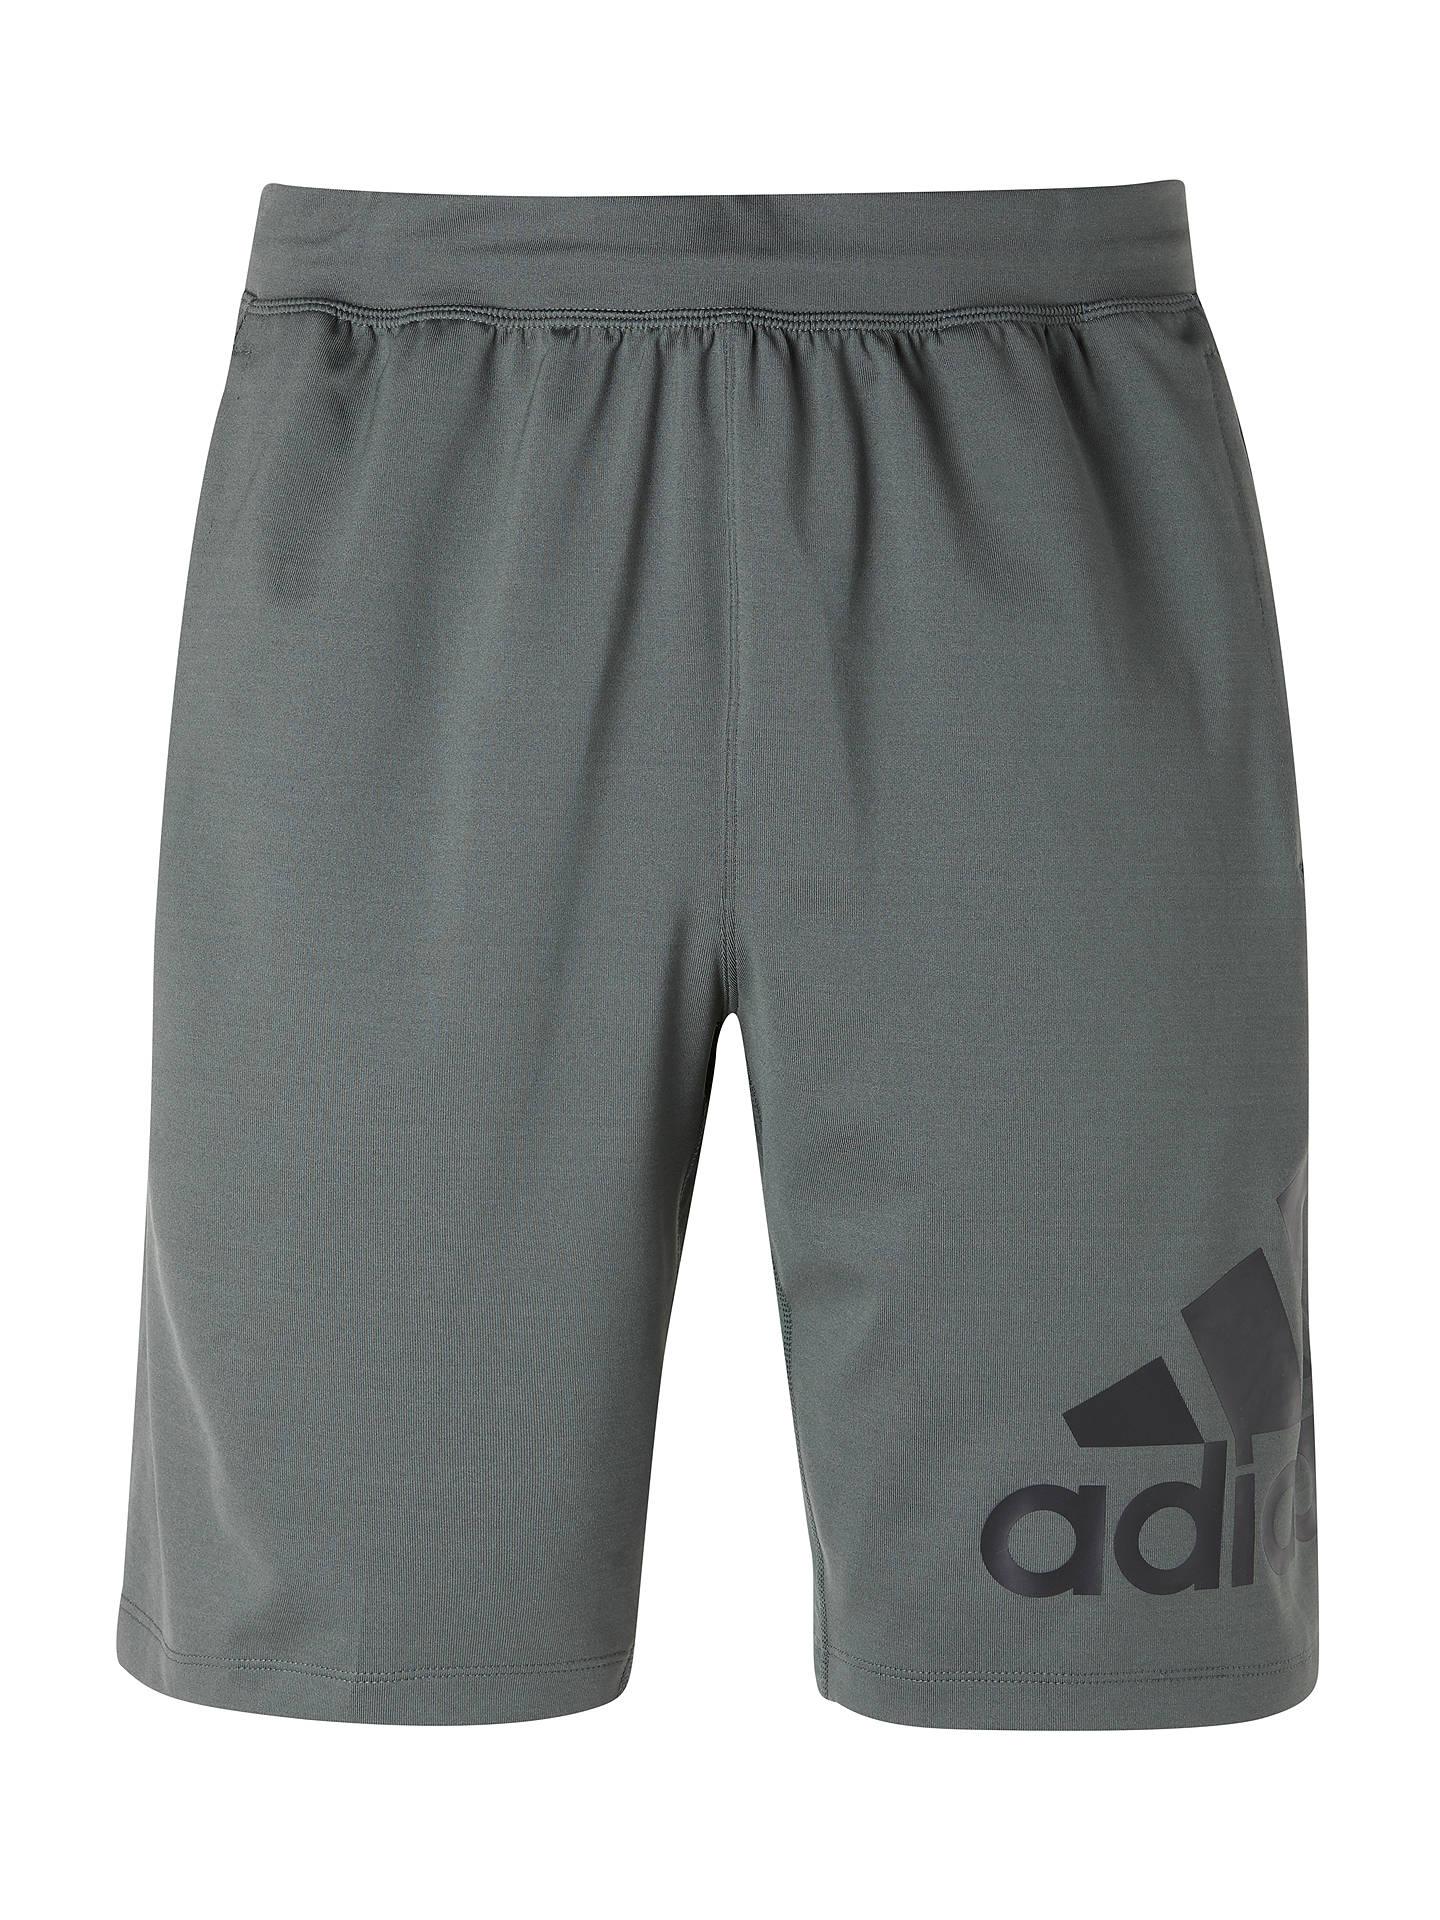 adidas 4krft Show Tech Shorts Small Sweat Running Training Climalite Boost